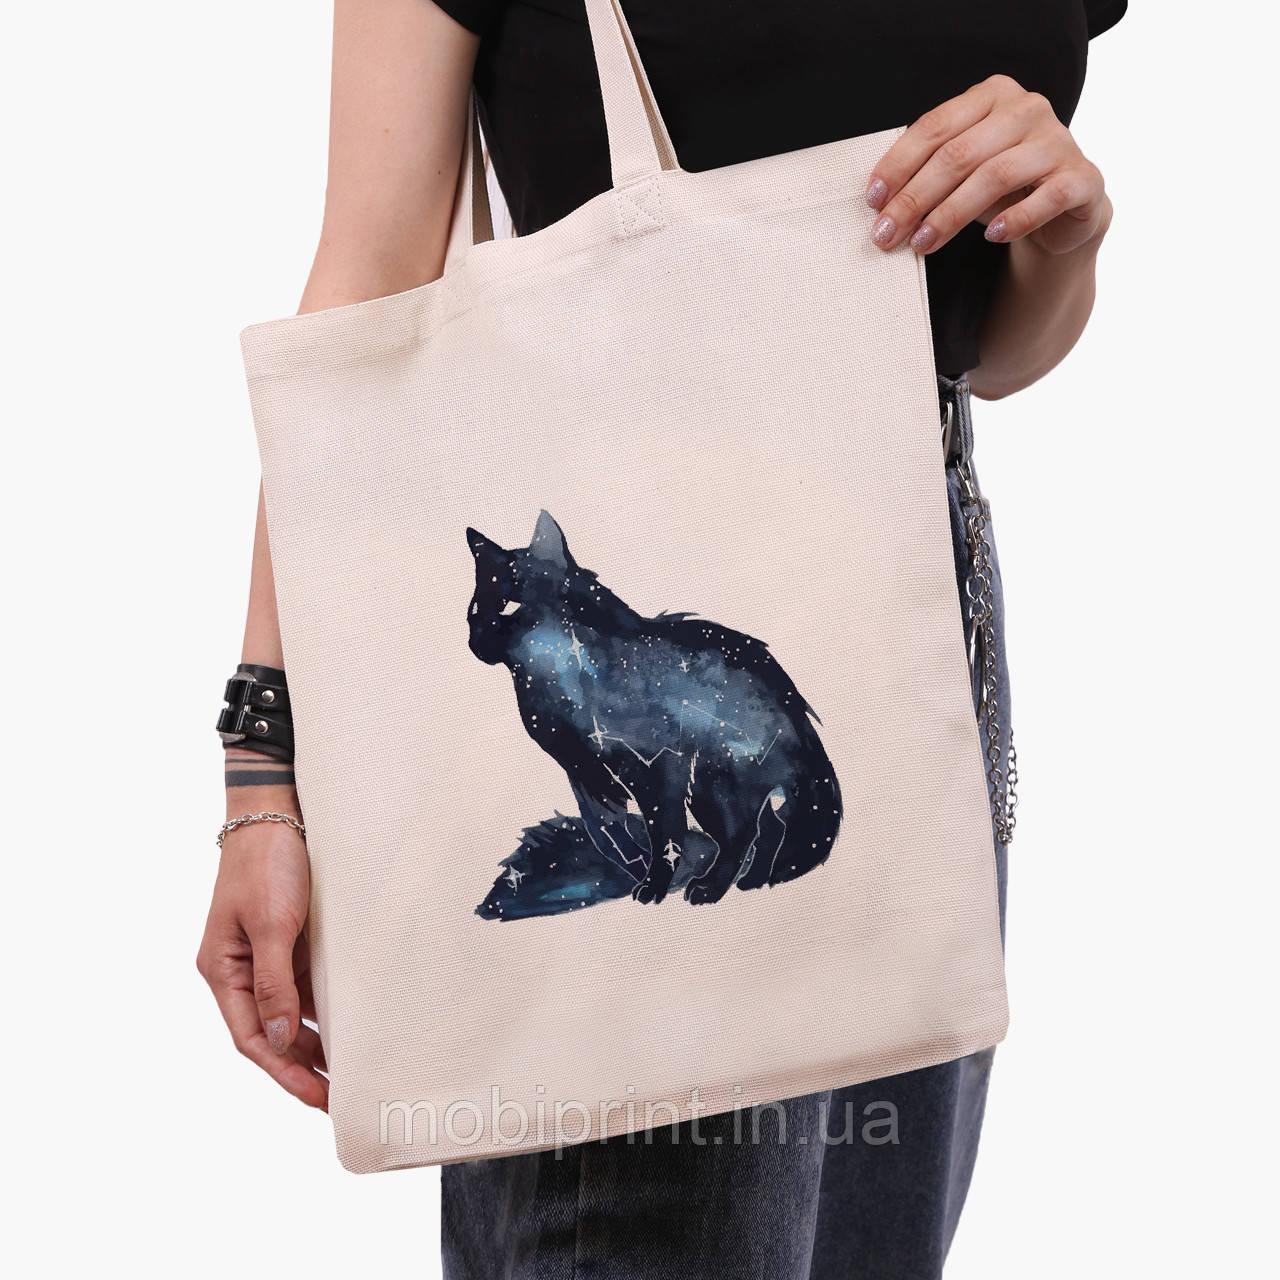 Еко сумка шоппер Сузір'я Кішка (Cat) (9227-1758) экосумка шопер 41*35 см